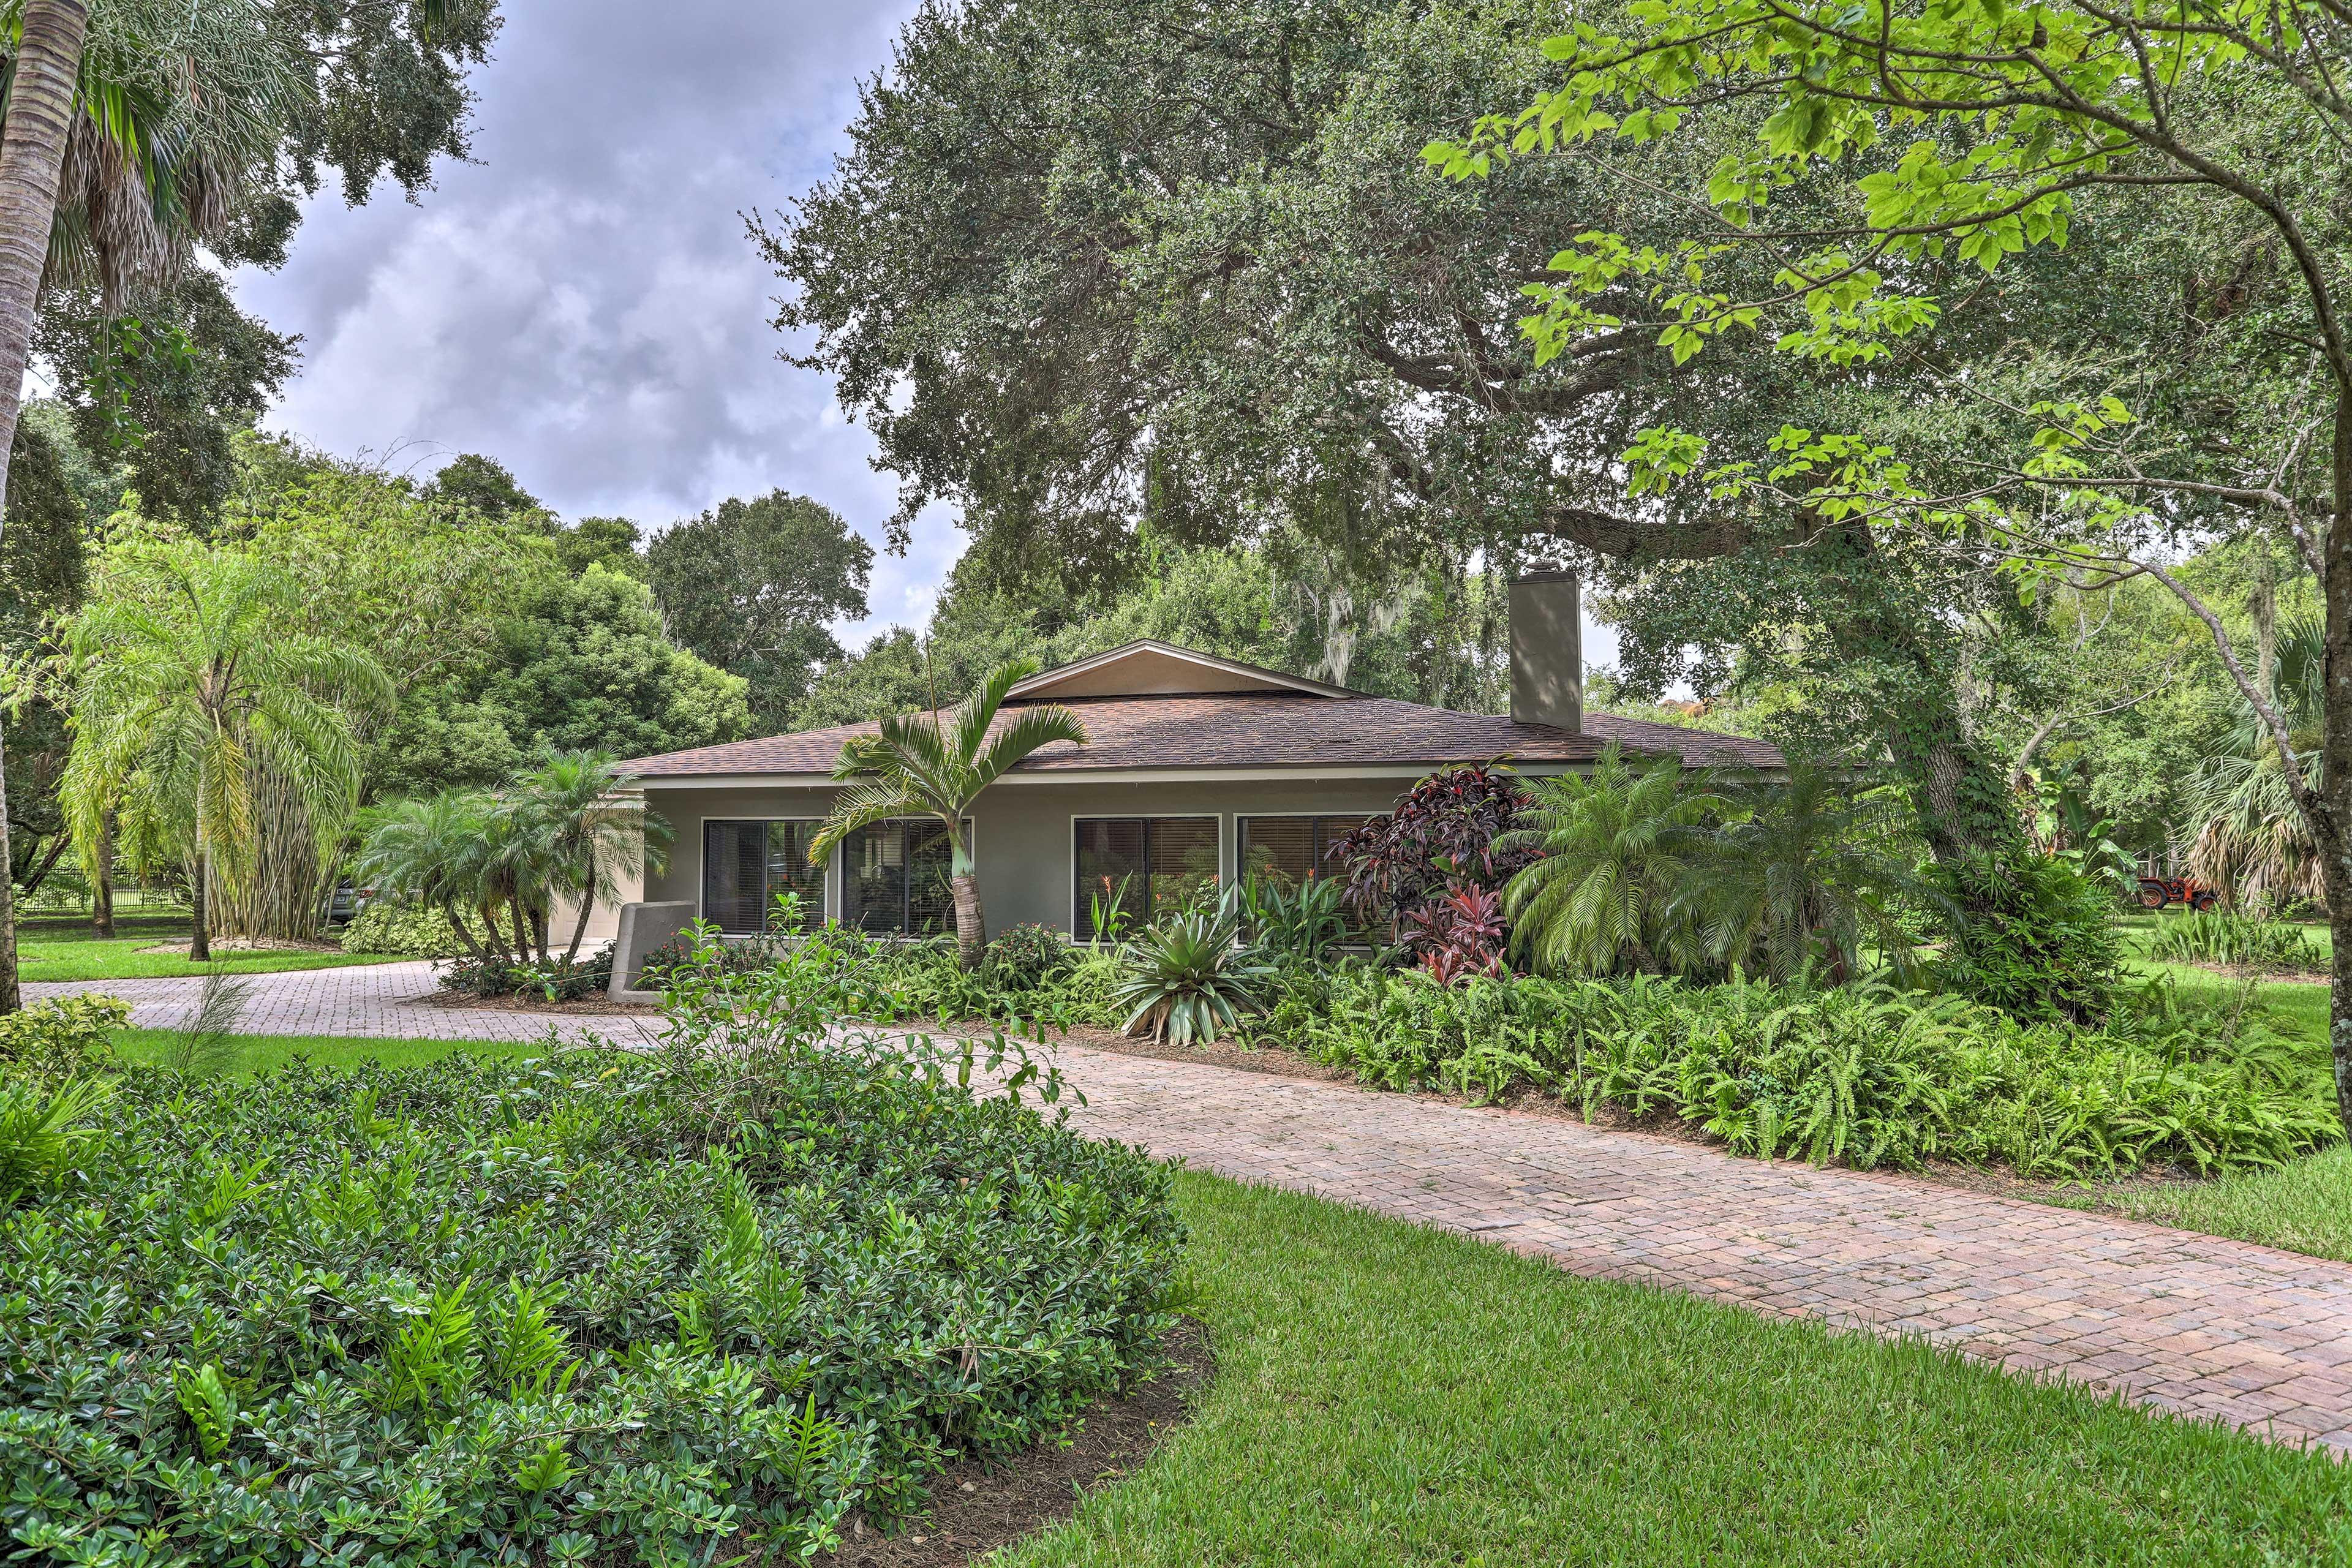 Lush tropical foliage surrounds this hidden home in Merritt Island, FL.